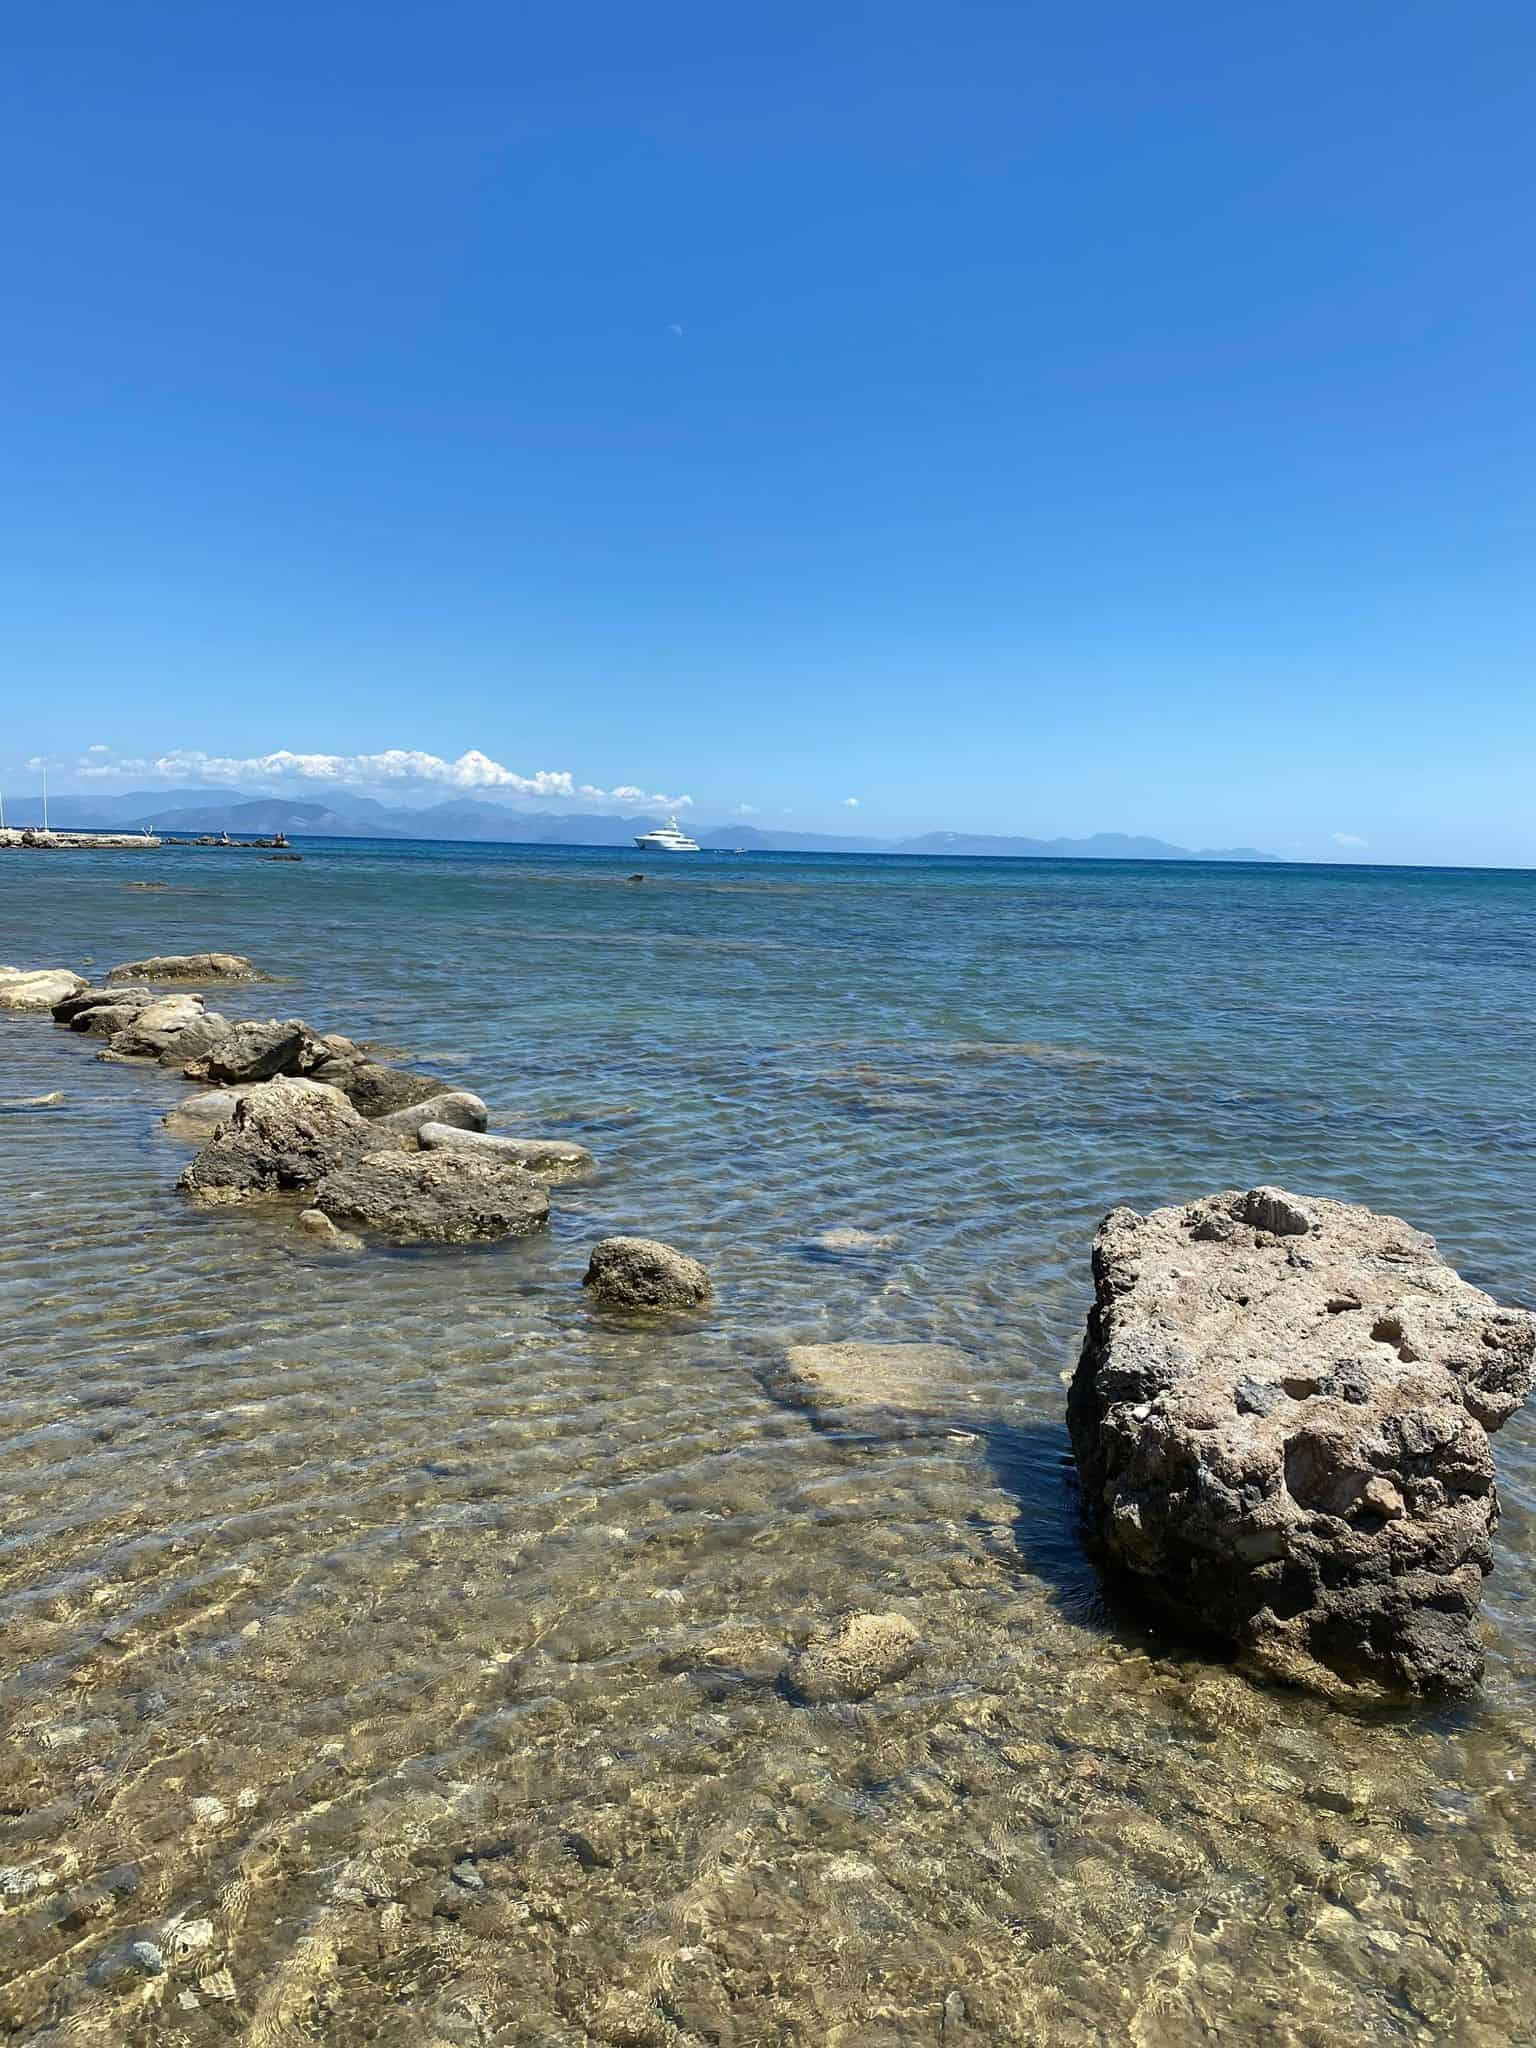 Places to visit in Corfu: Kanoni